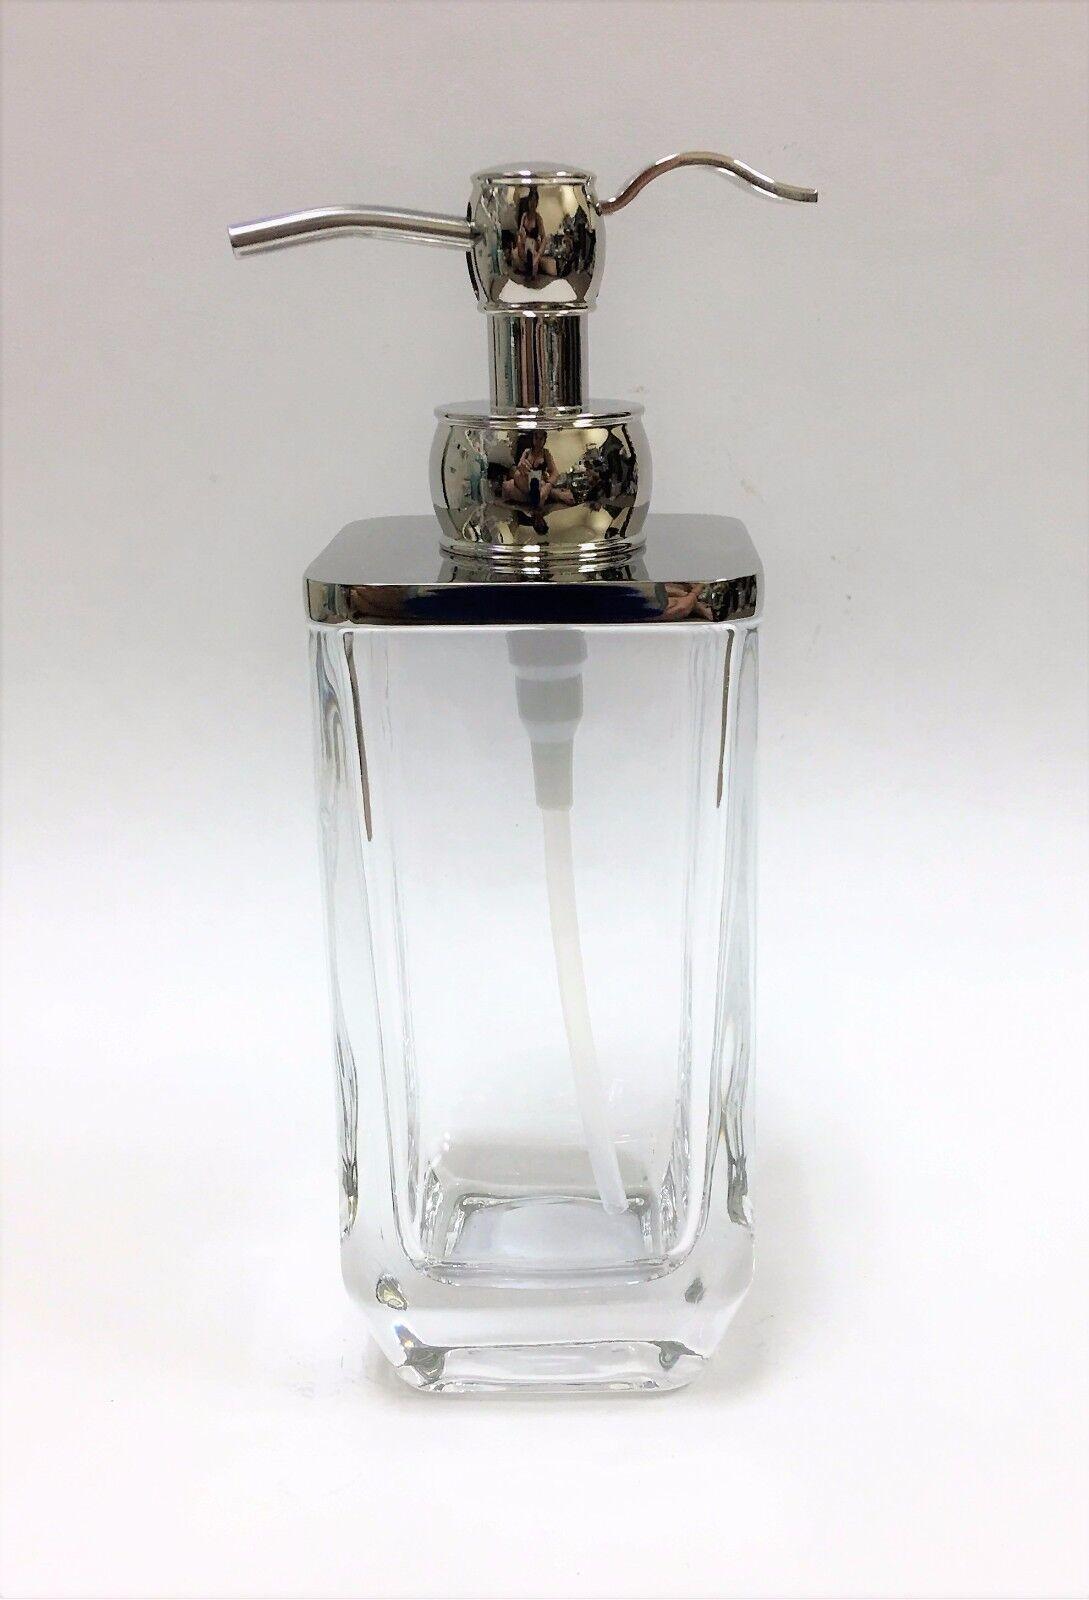 Poliert Silber  Schwer Transparentes Glas Lotion, Seife Badezimmer, Küche | New Product 2019